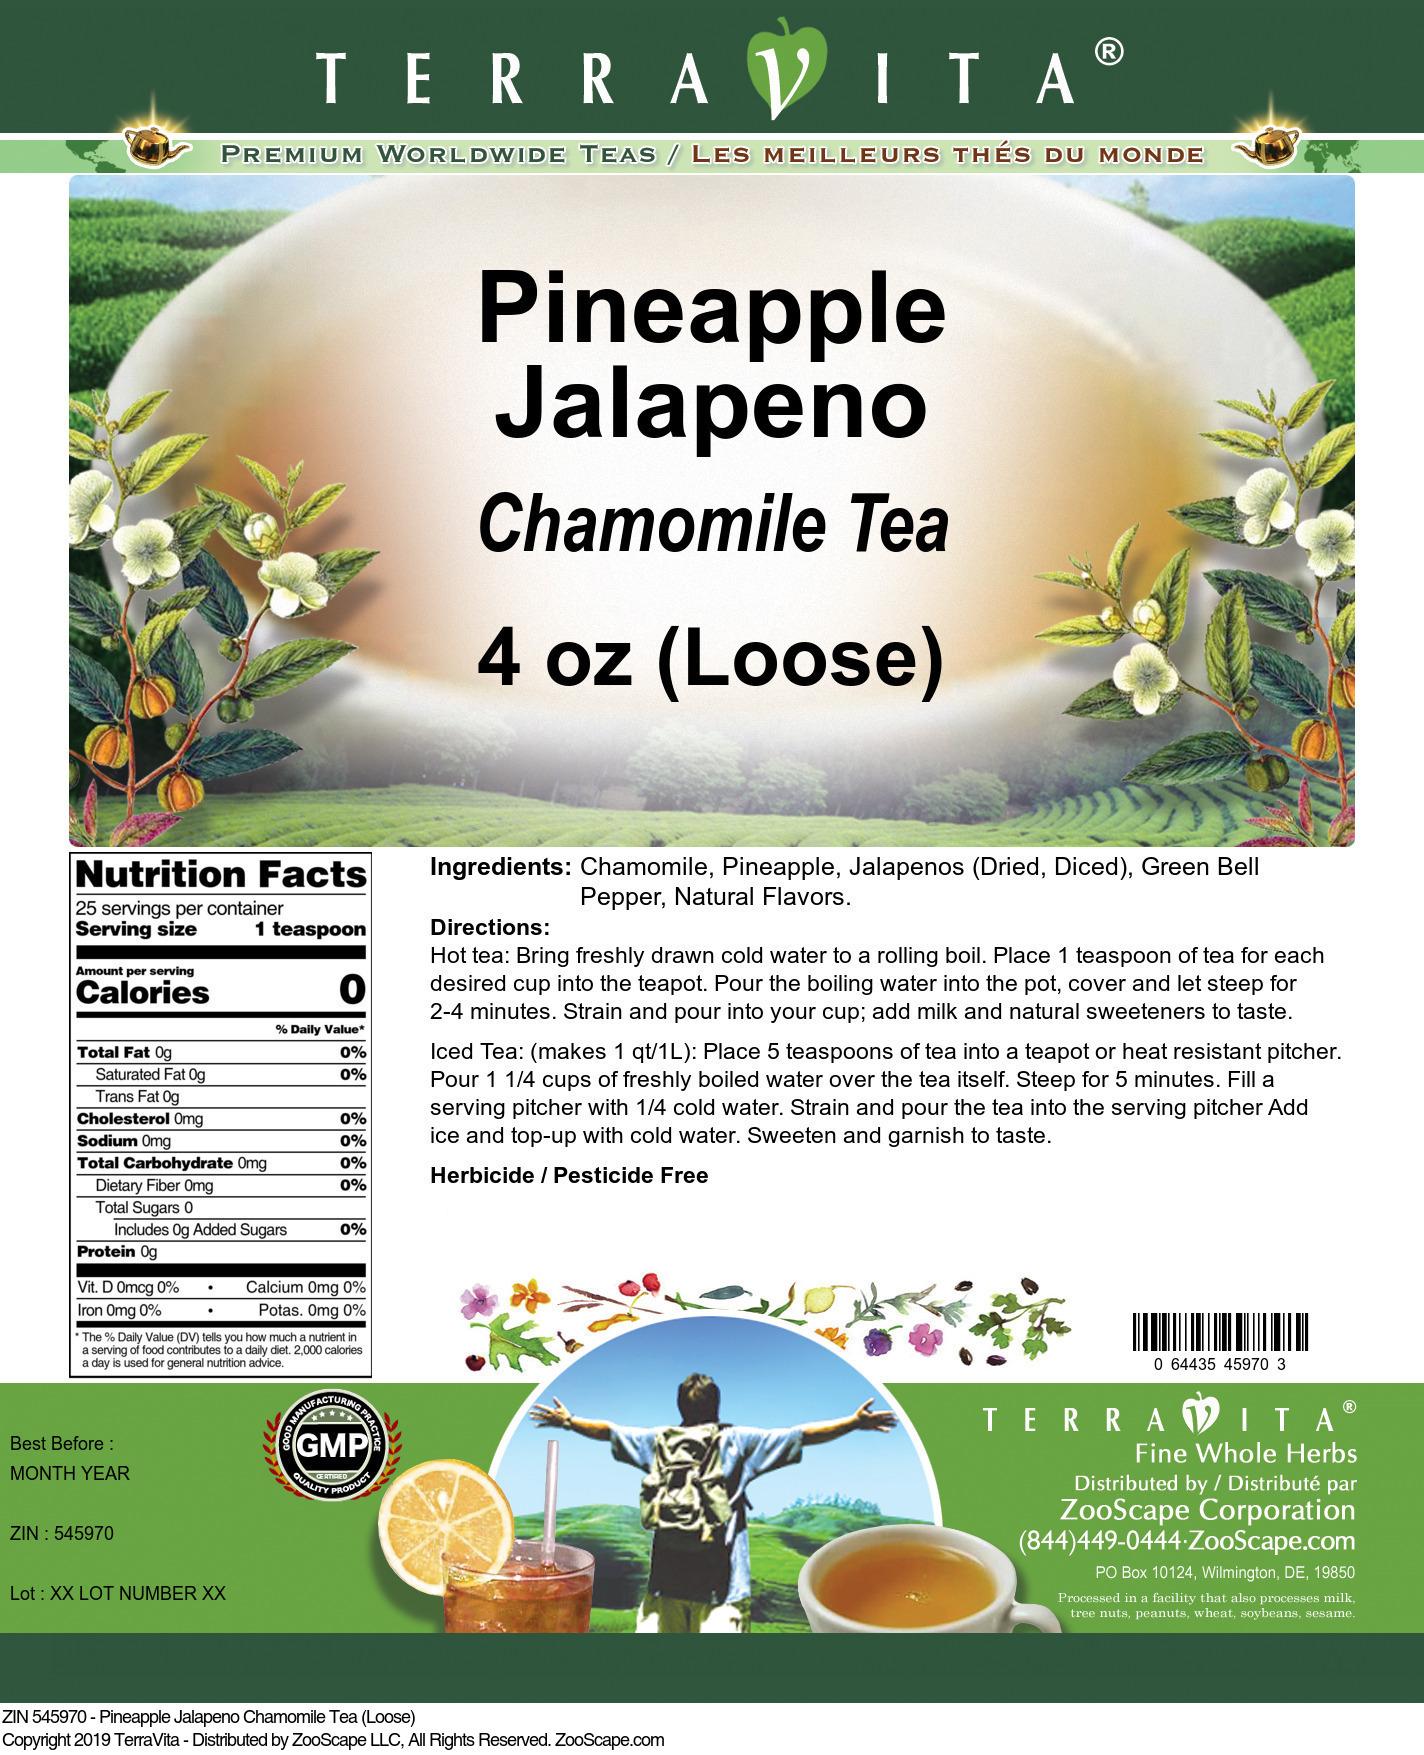 Pineapple Jalapeno Chamomile Tea